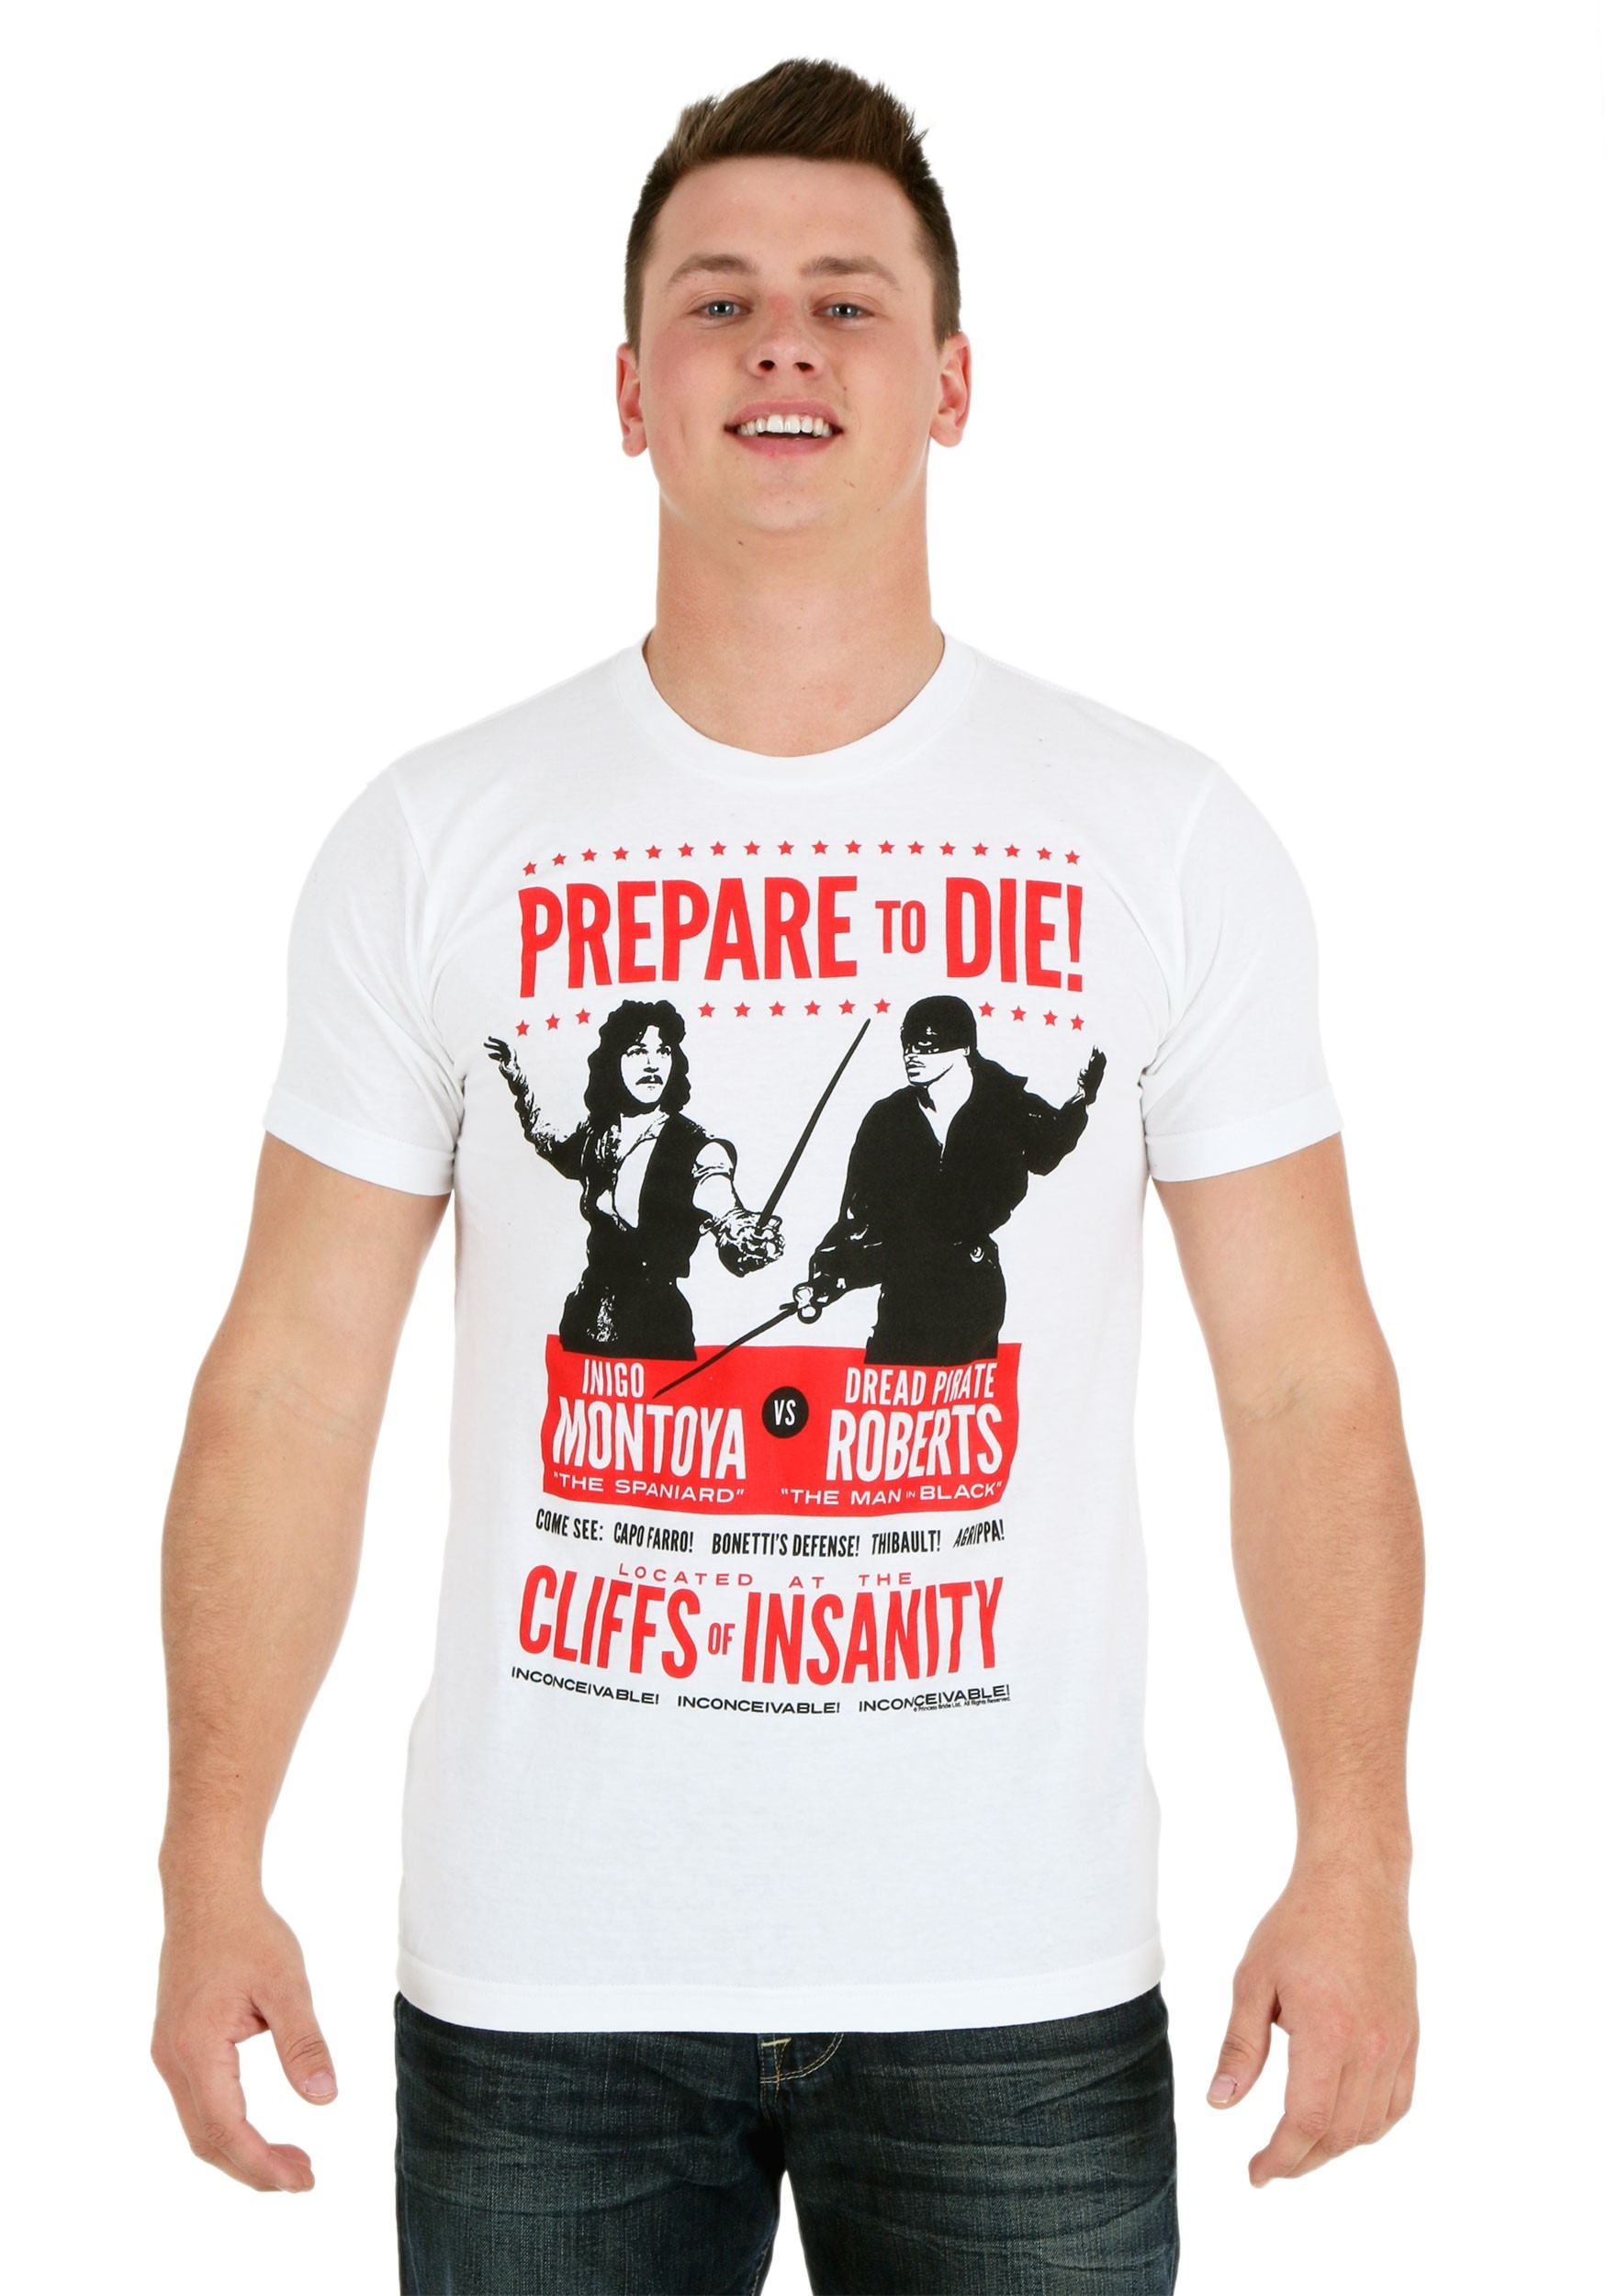 Princess Bride Prepare To Die Poster Men's T-Shirt